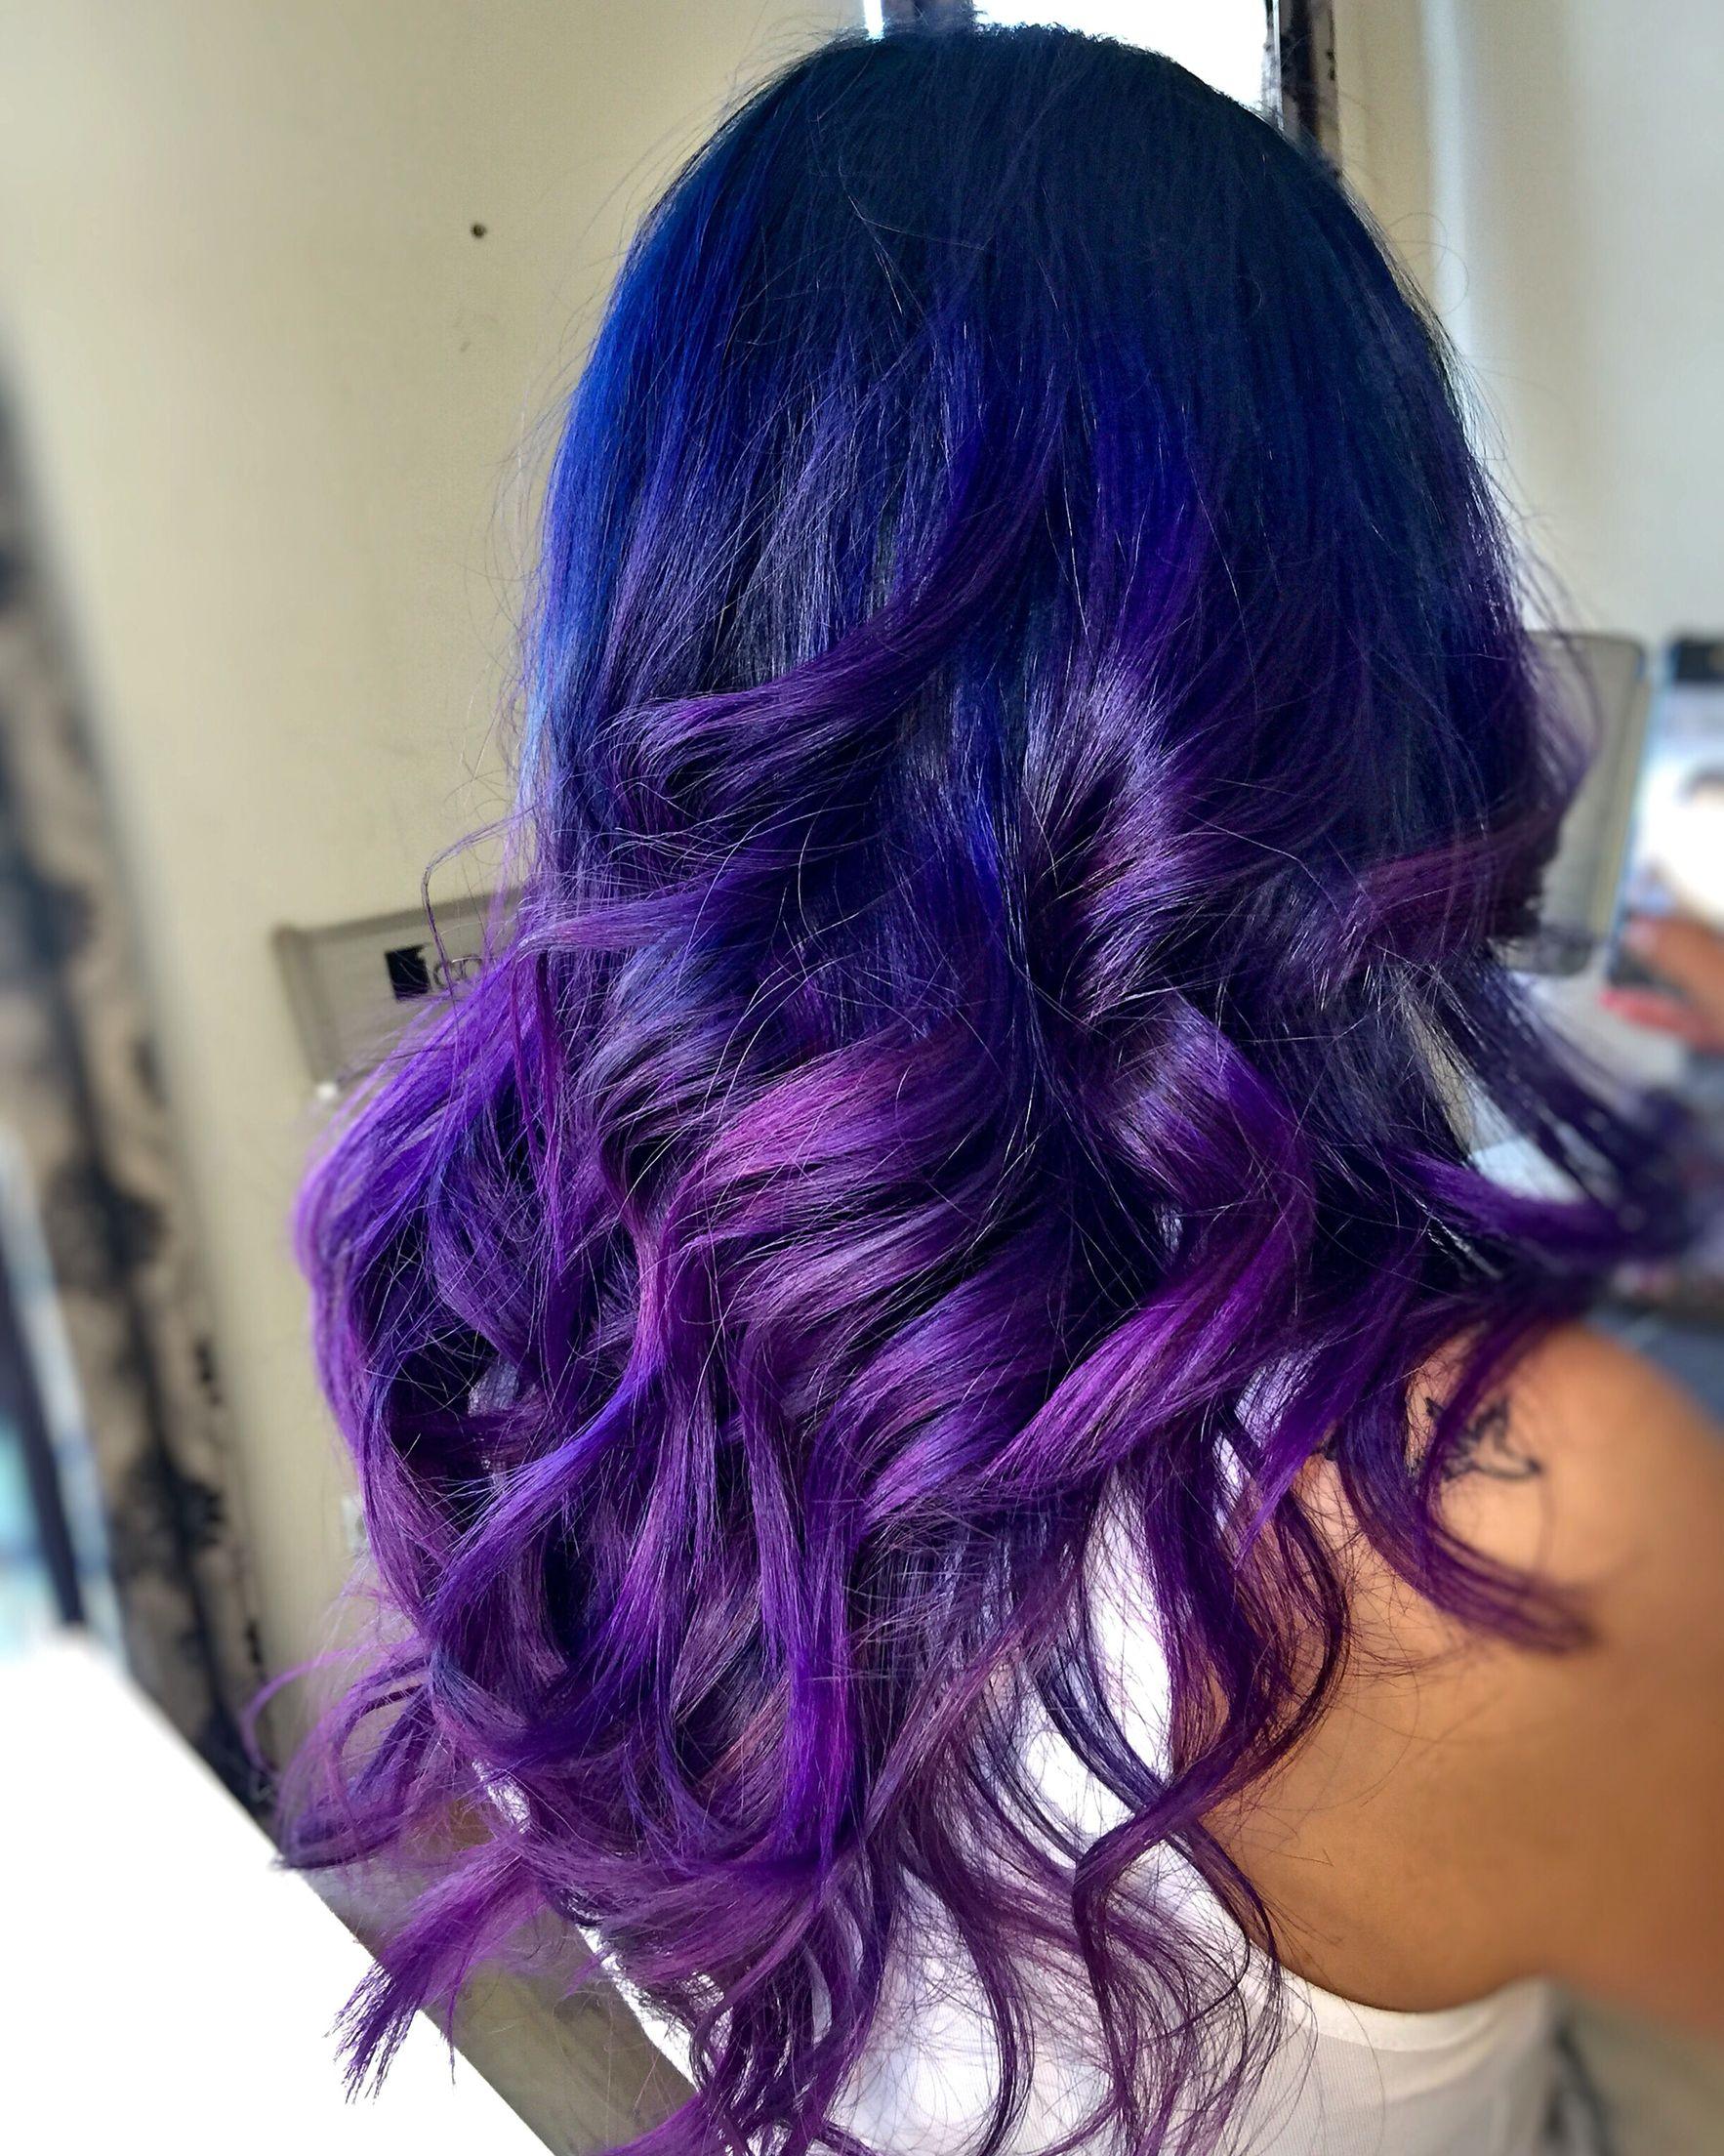 Colomelt Hair Color Violet Blue Hair Styles Silver Hair Color Professional Hair Color